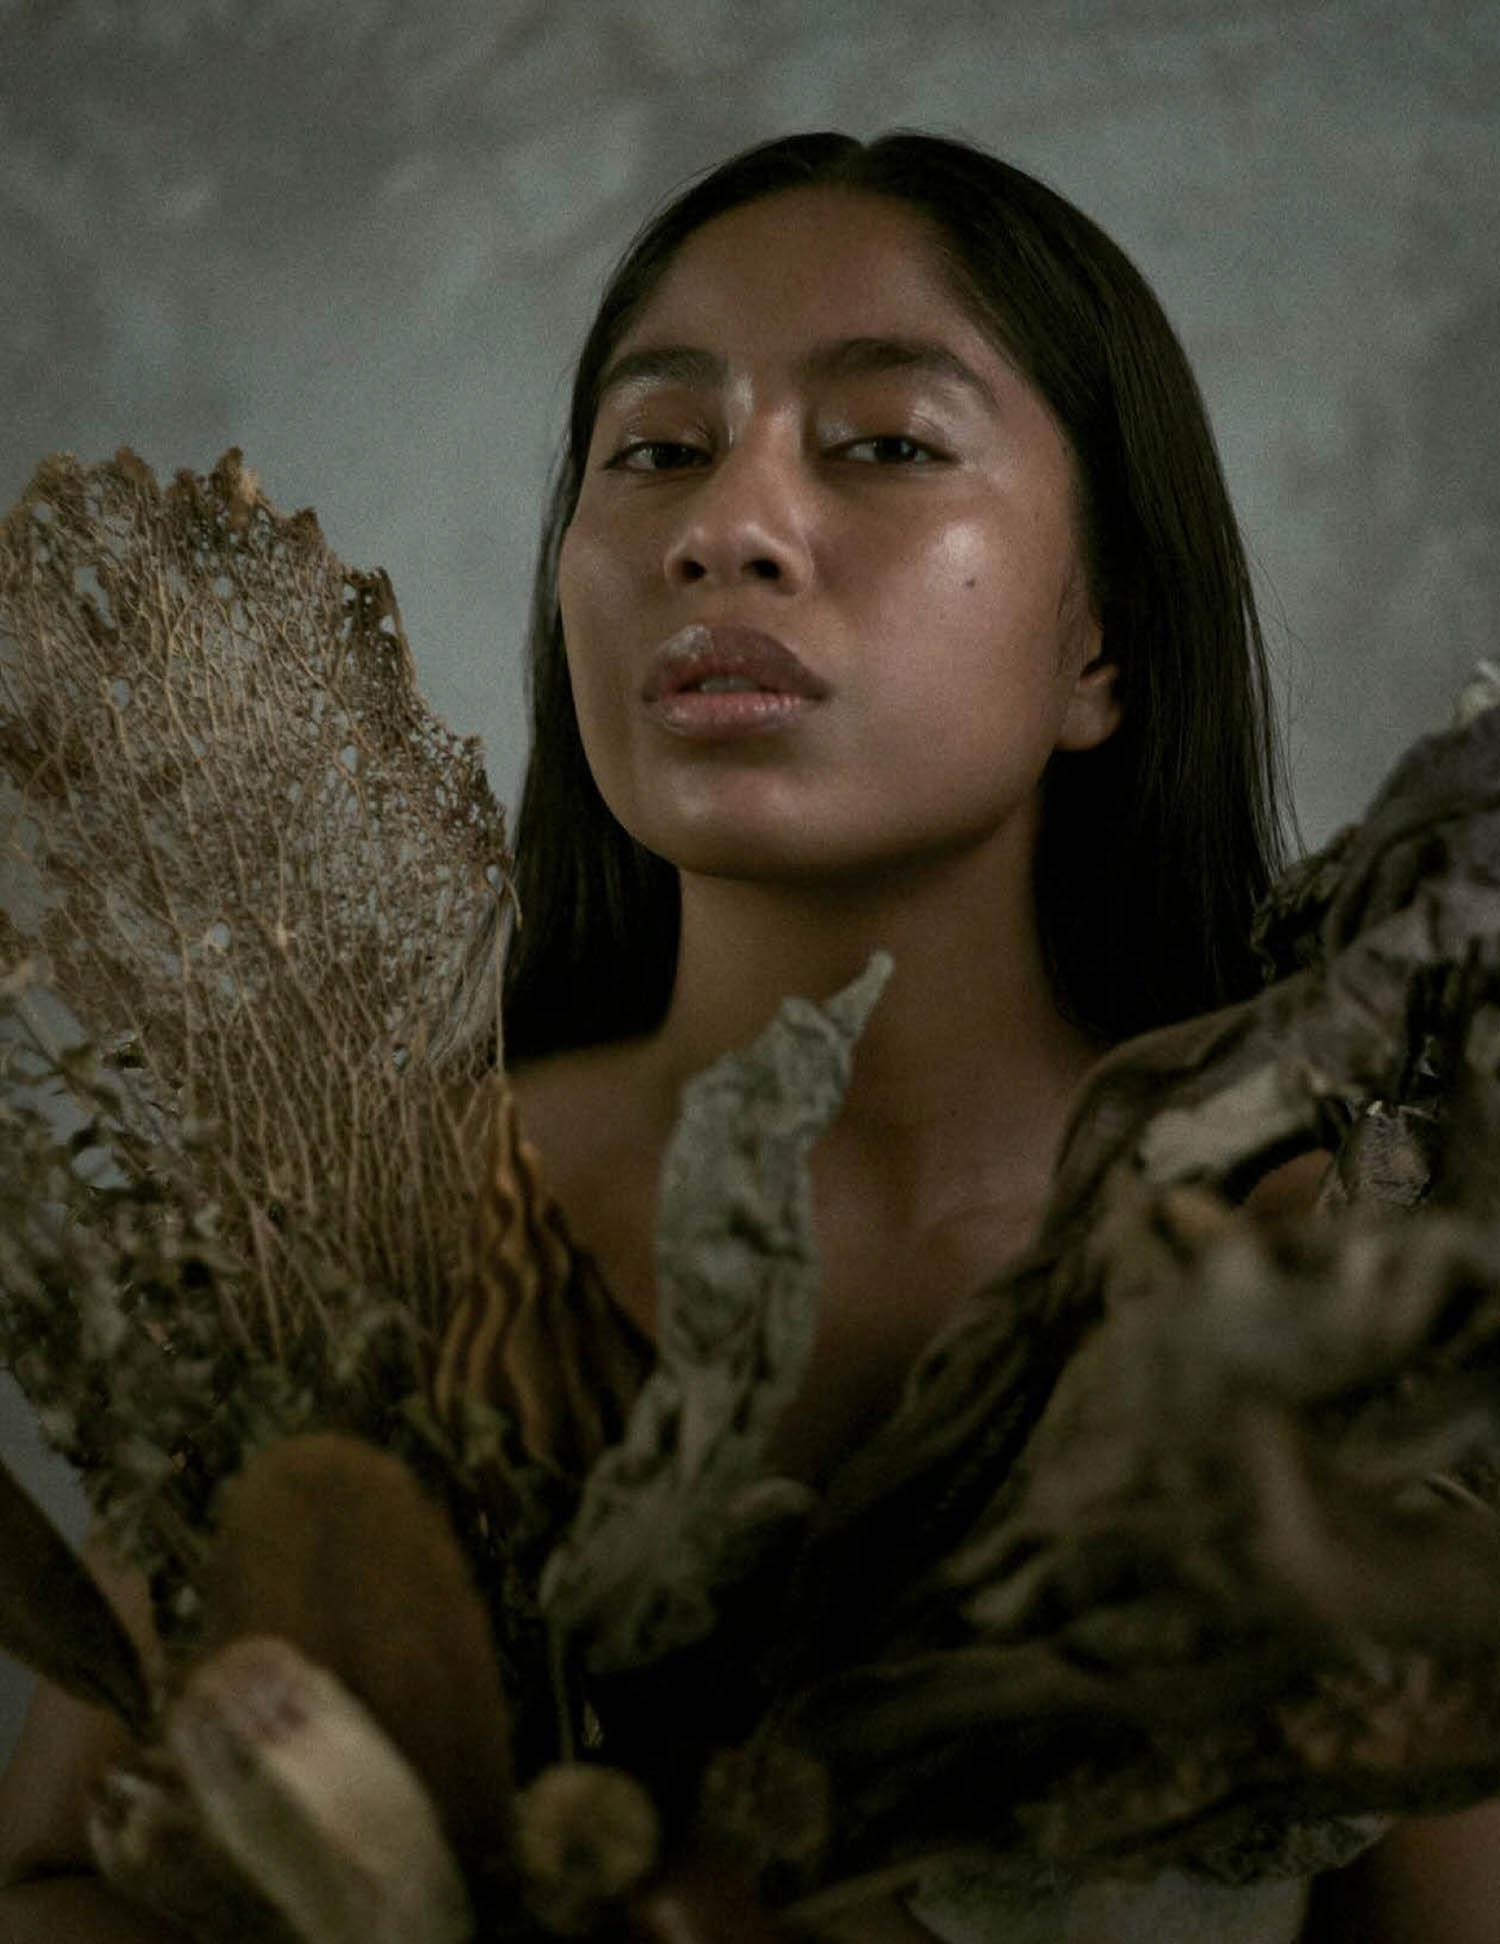 Karen Vega by Mauricio Sierra for Vogue Mexico & Latin America March 2021